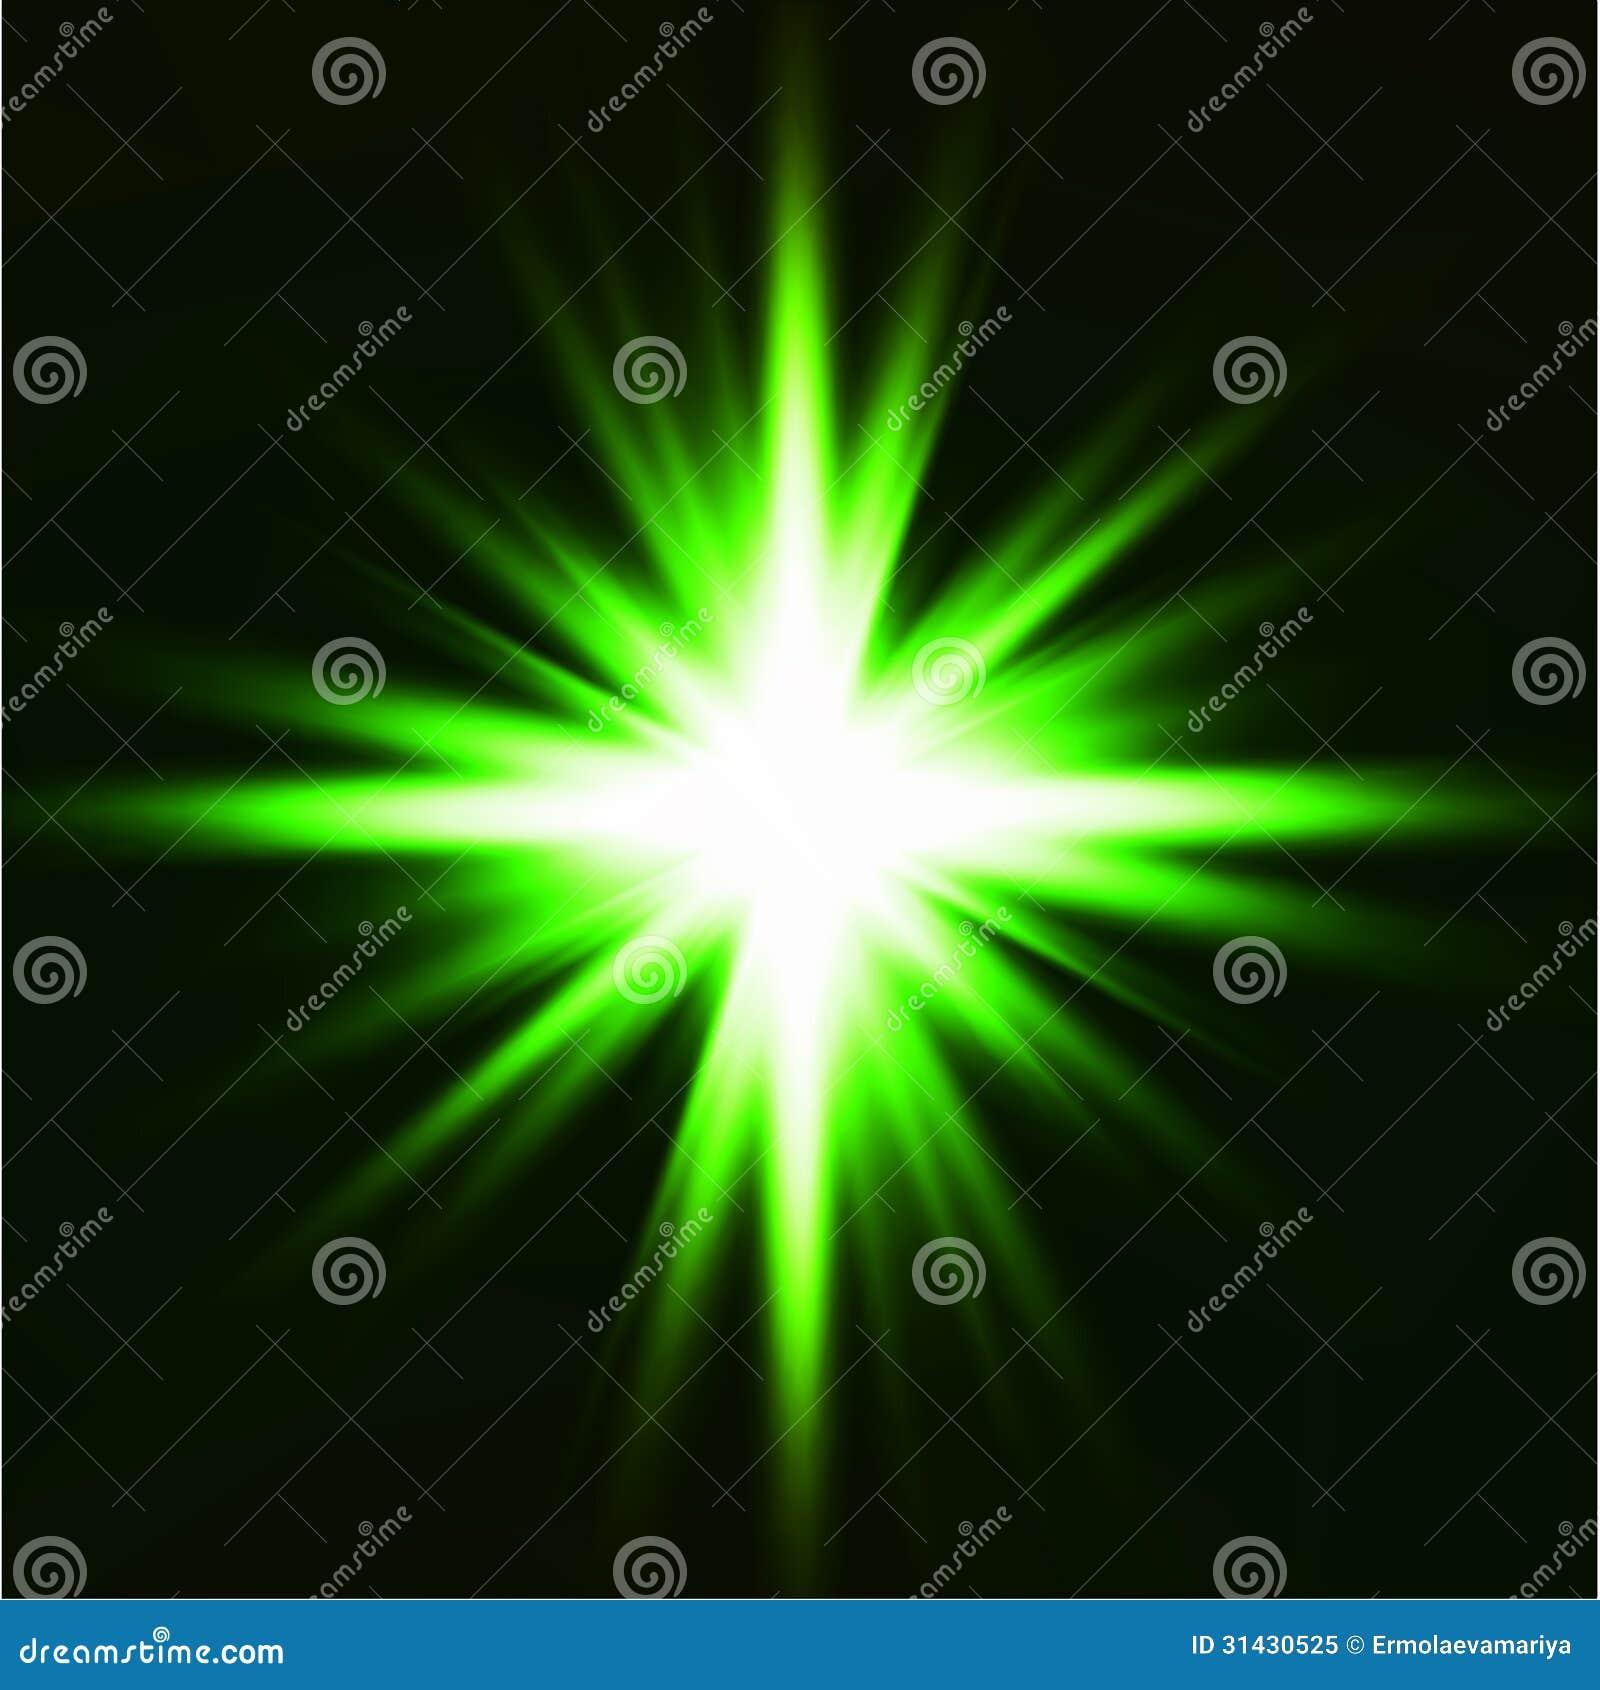 Light Flare Green Effect. Vector Stock Vector - Illustration of ... for Green Light Effects Background  156eri